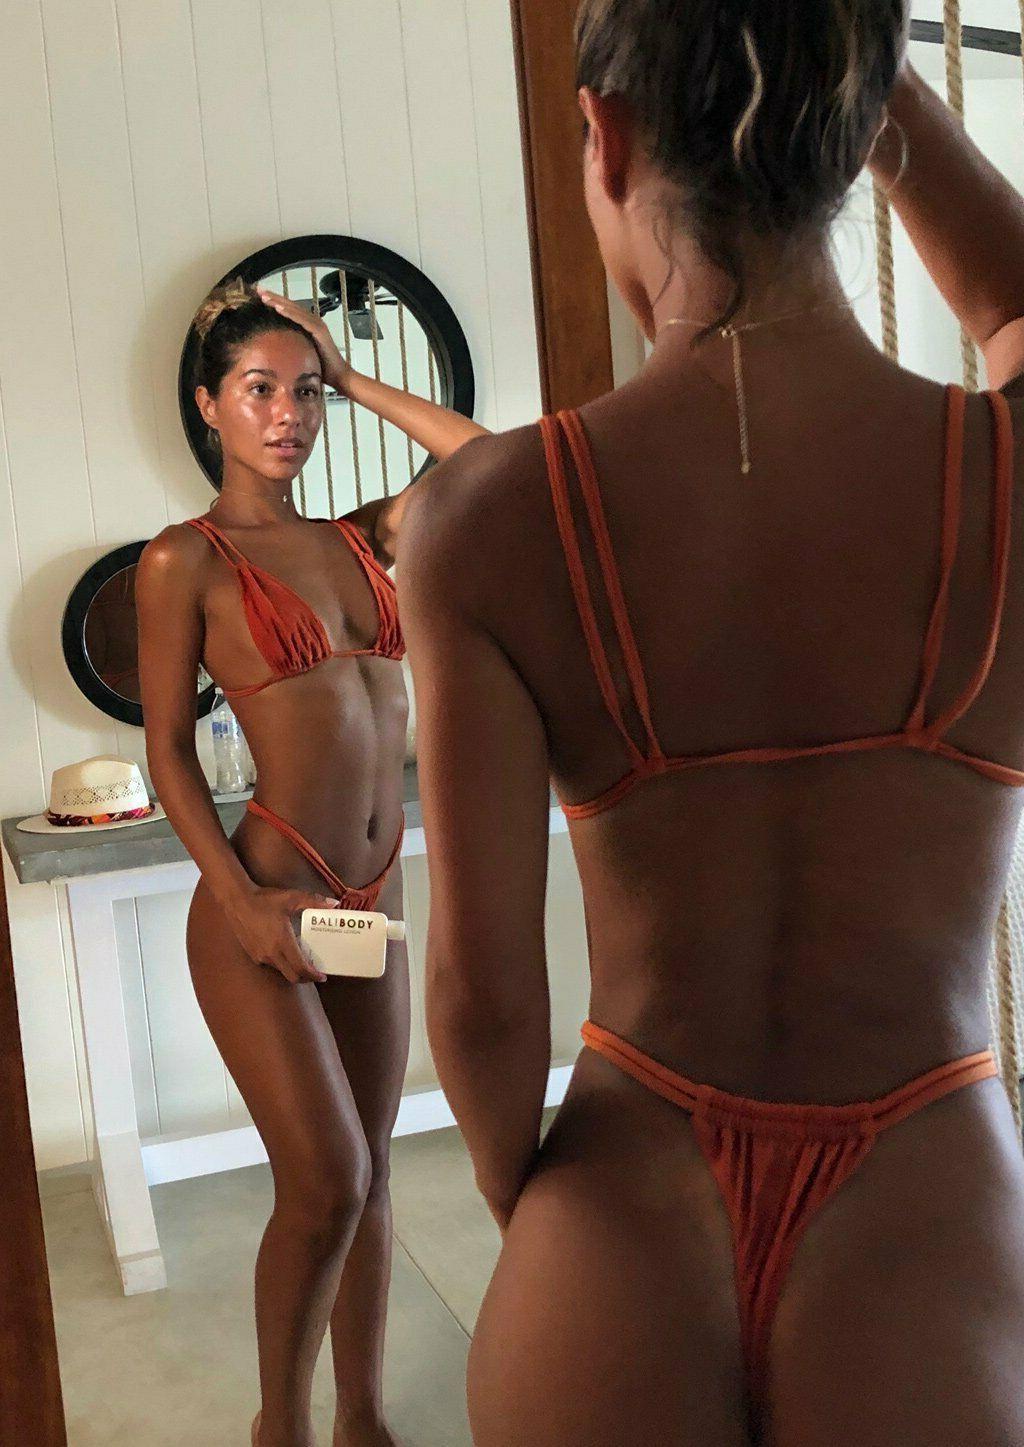 BaliBody Moisturising Lotion All Skin Types Natural Deep